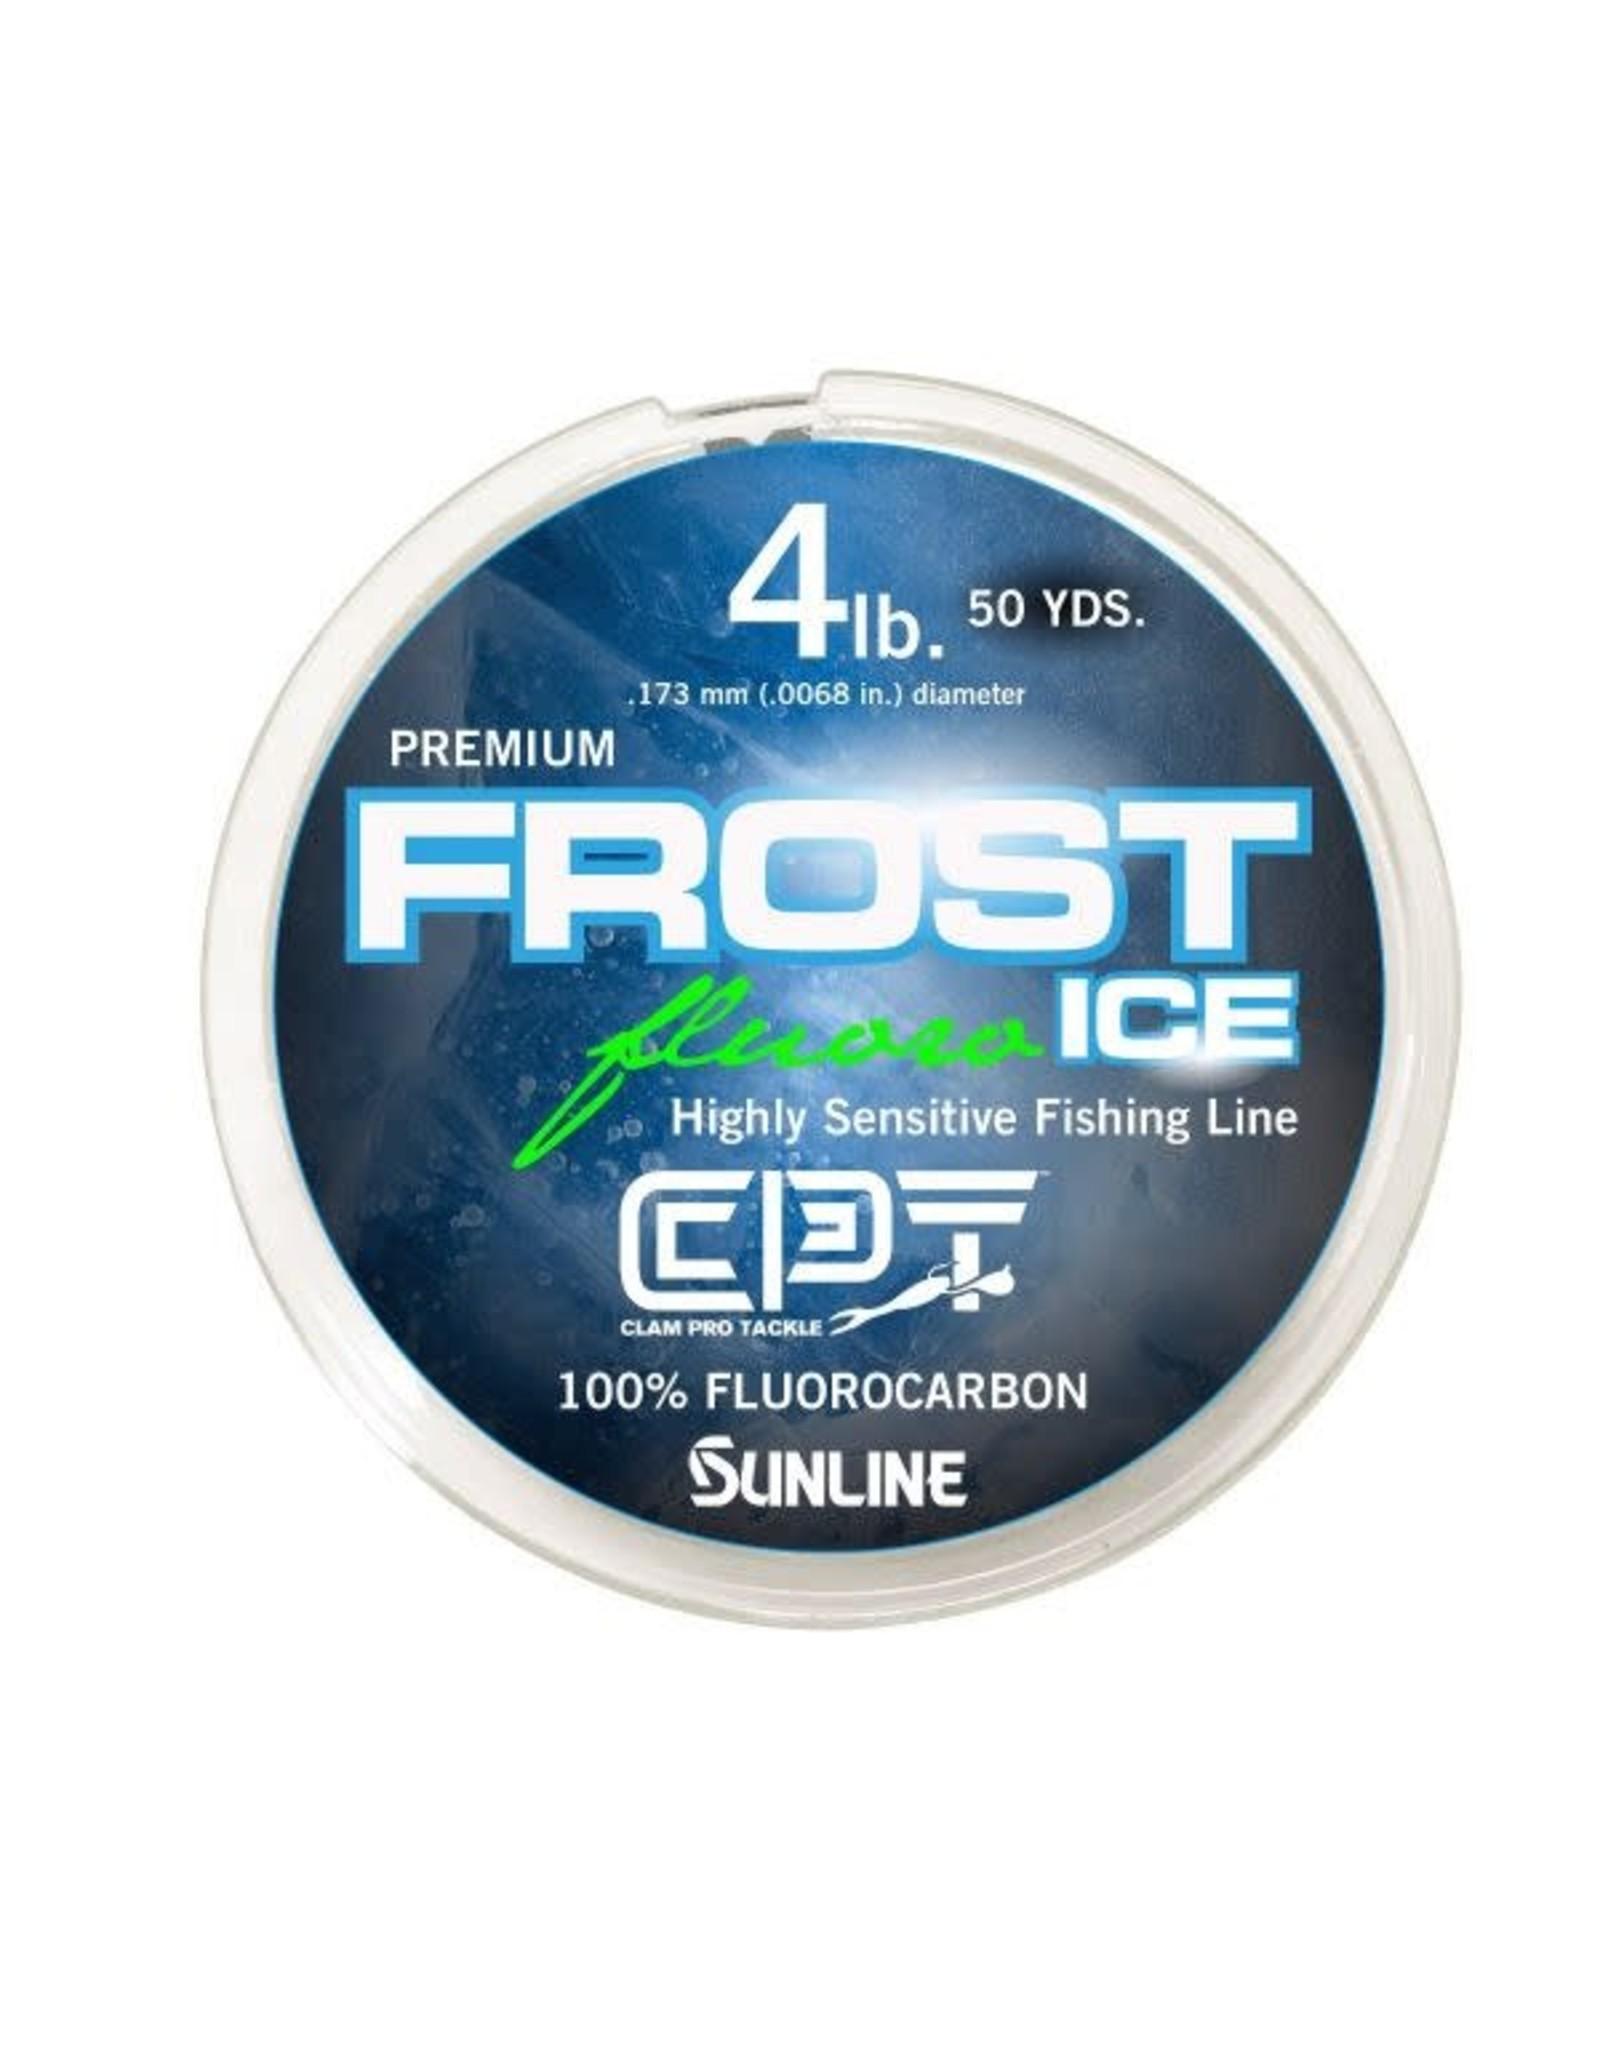 Clam Clam Frost Premium Fluorocarbon Ice Line